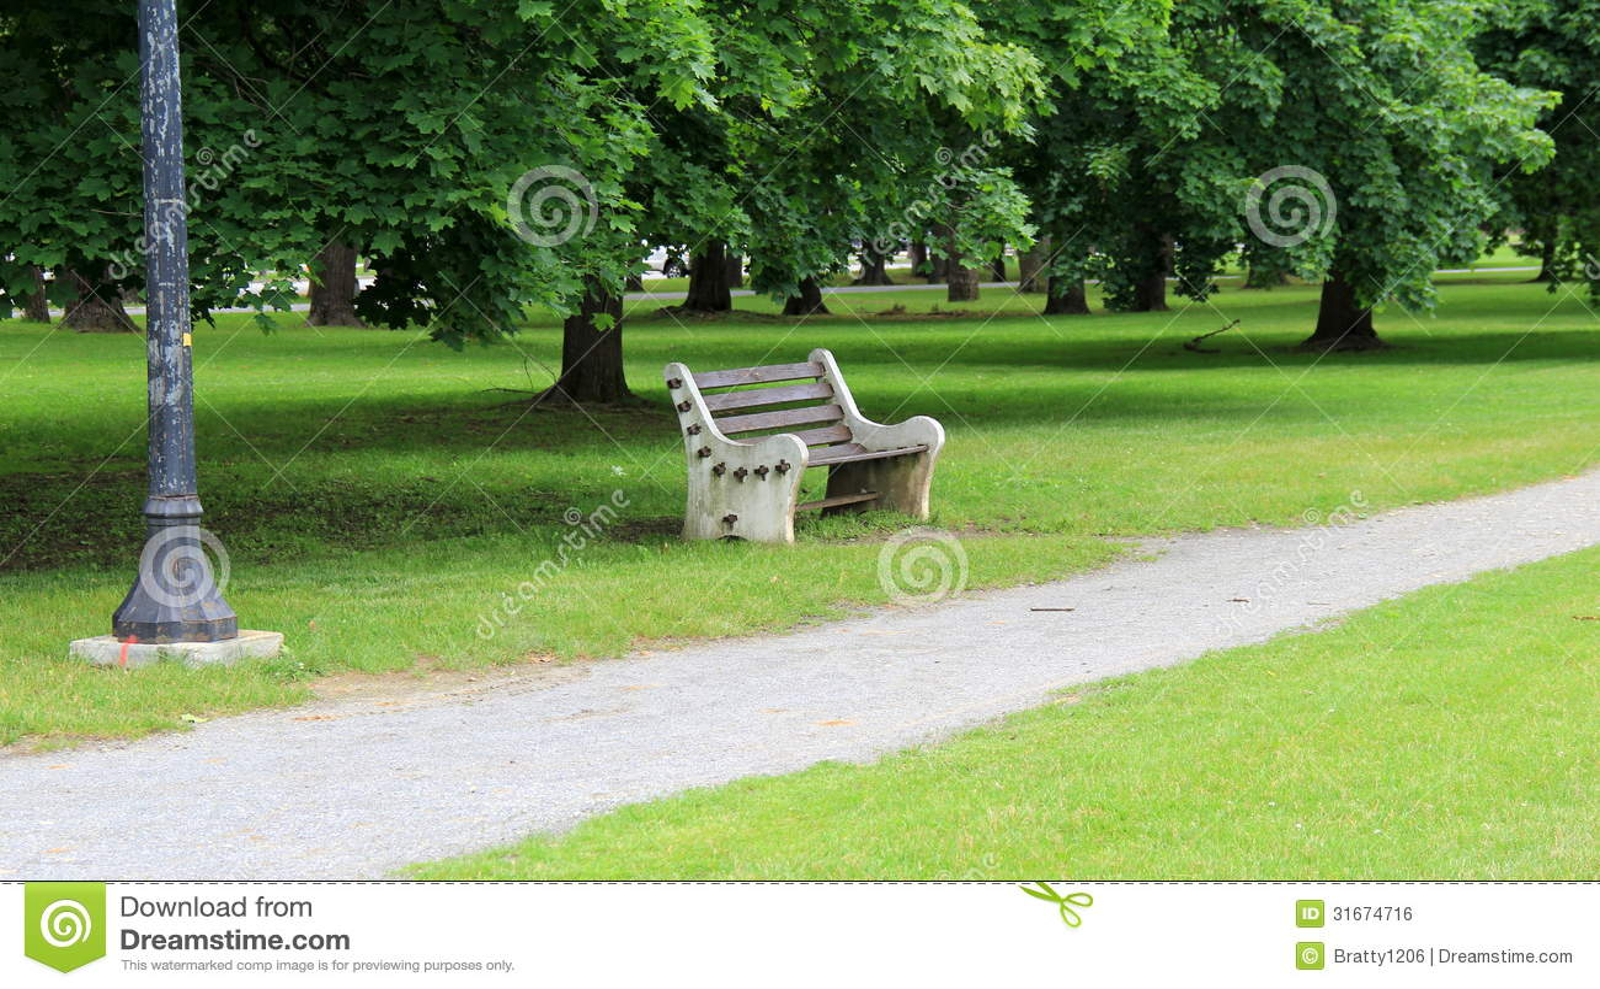 Empty Park Bench Under Shady Trees Royalty Free Stock Image - Image ...